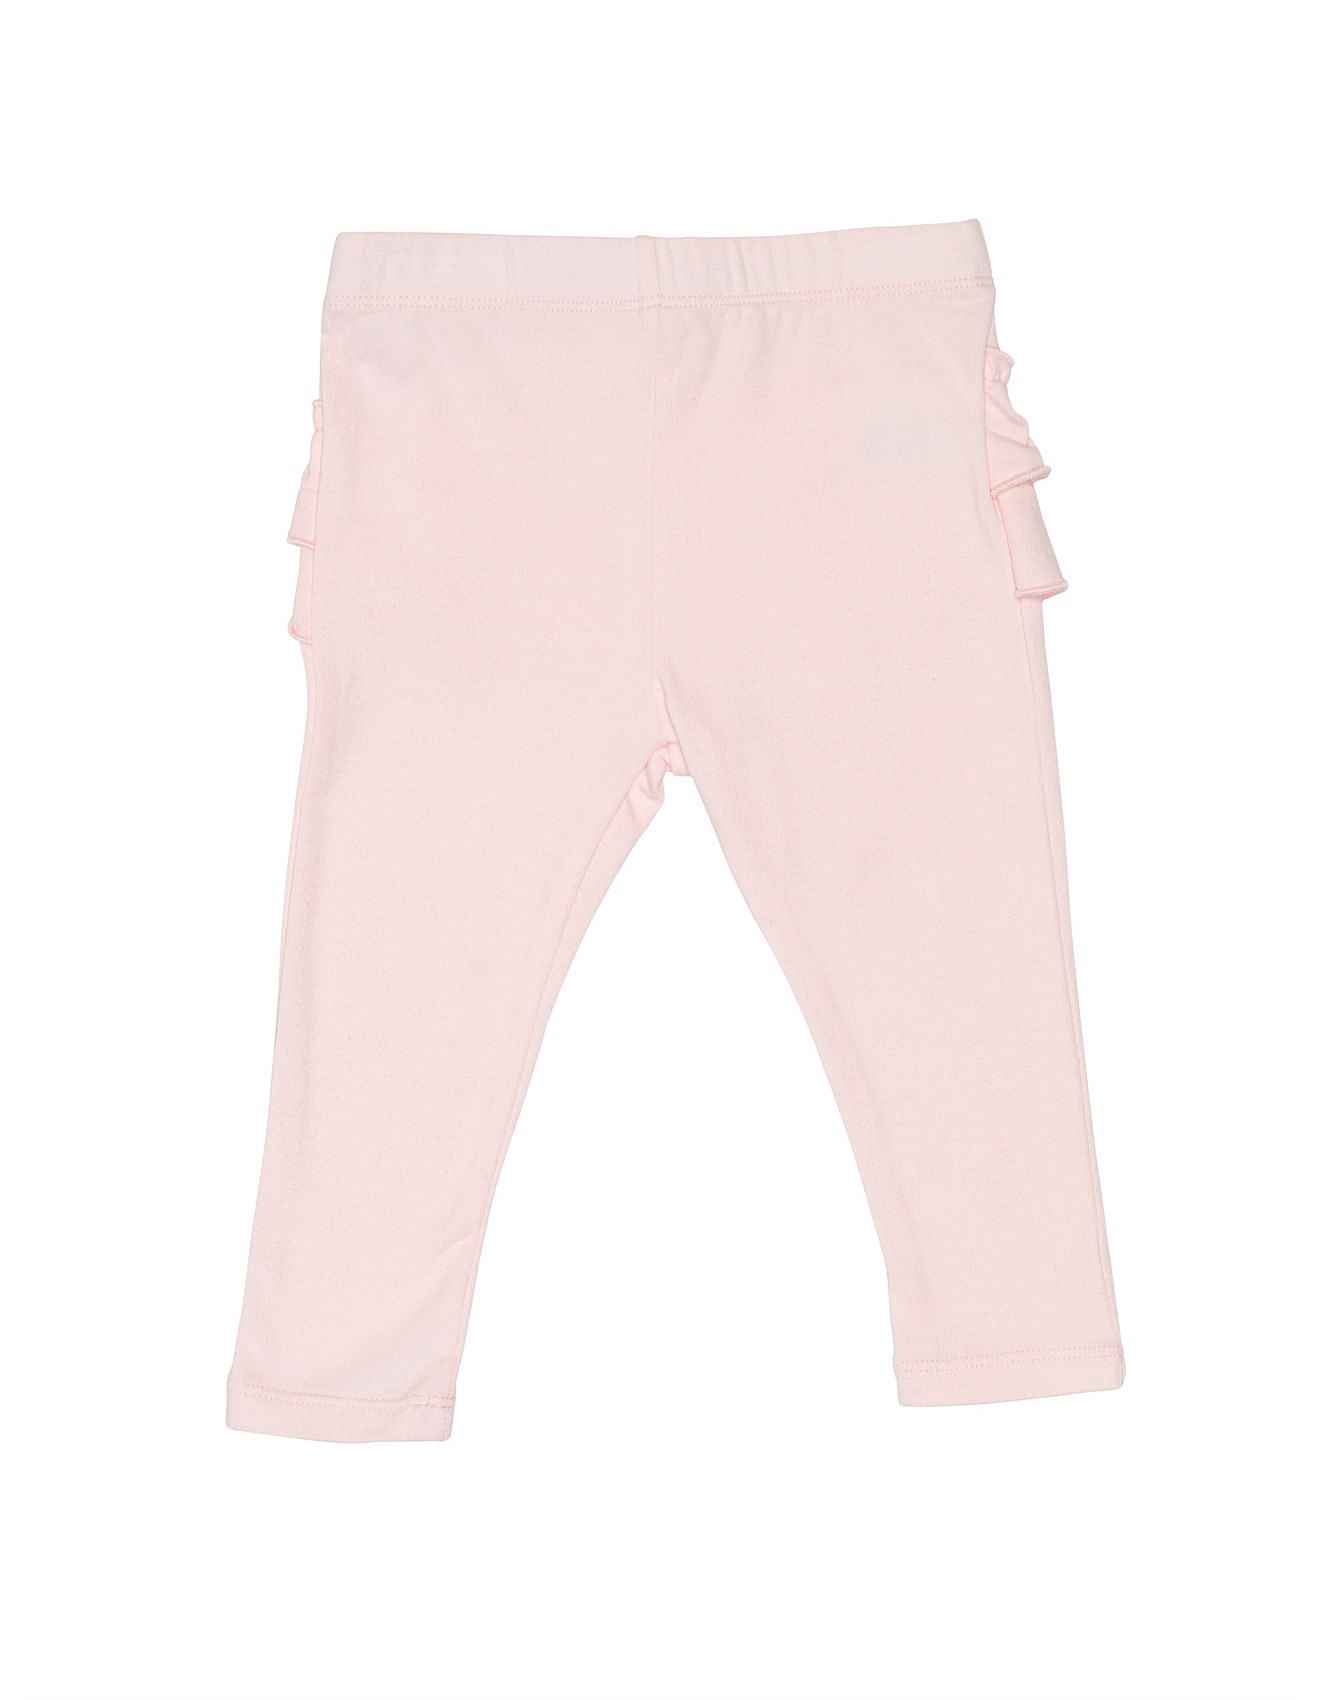 aa23dd26ffb818 Baby - Cotton/Elastane Plain Legging(3M-24M)